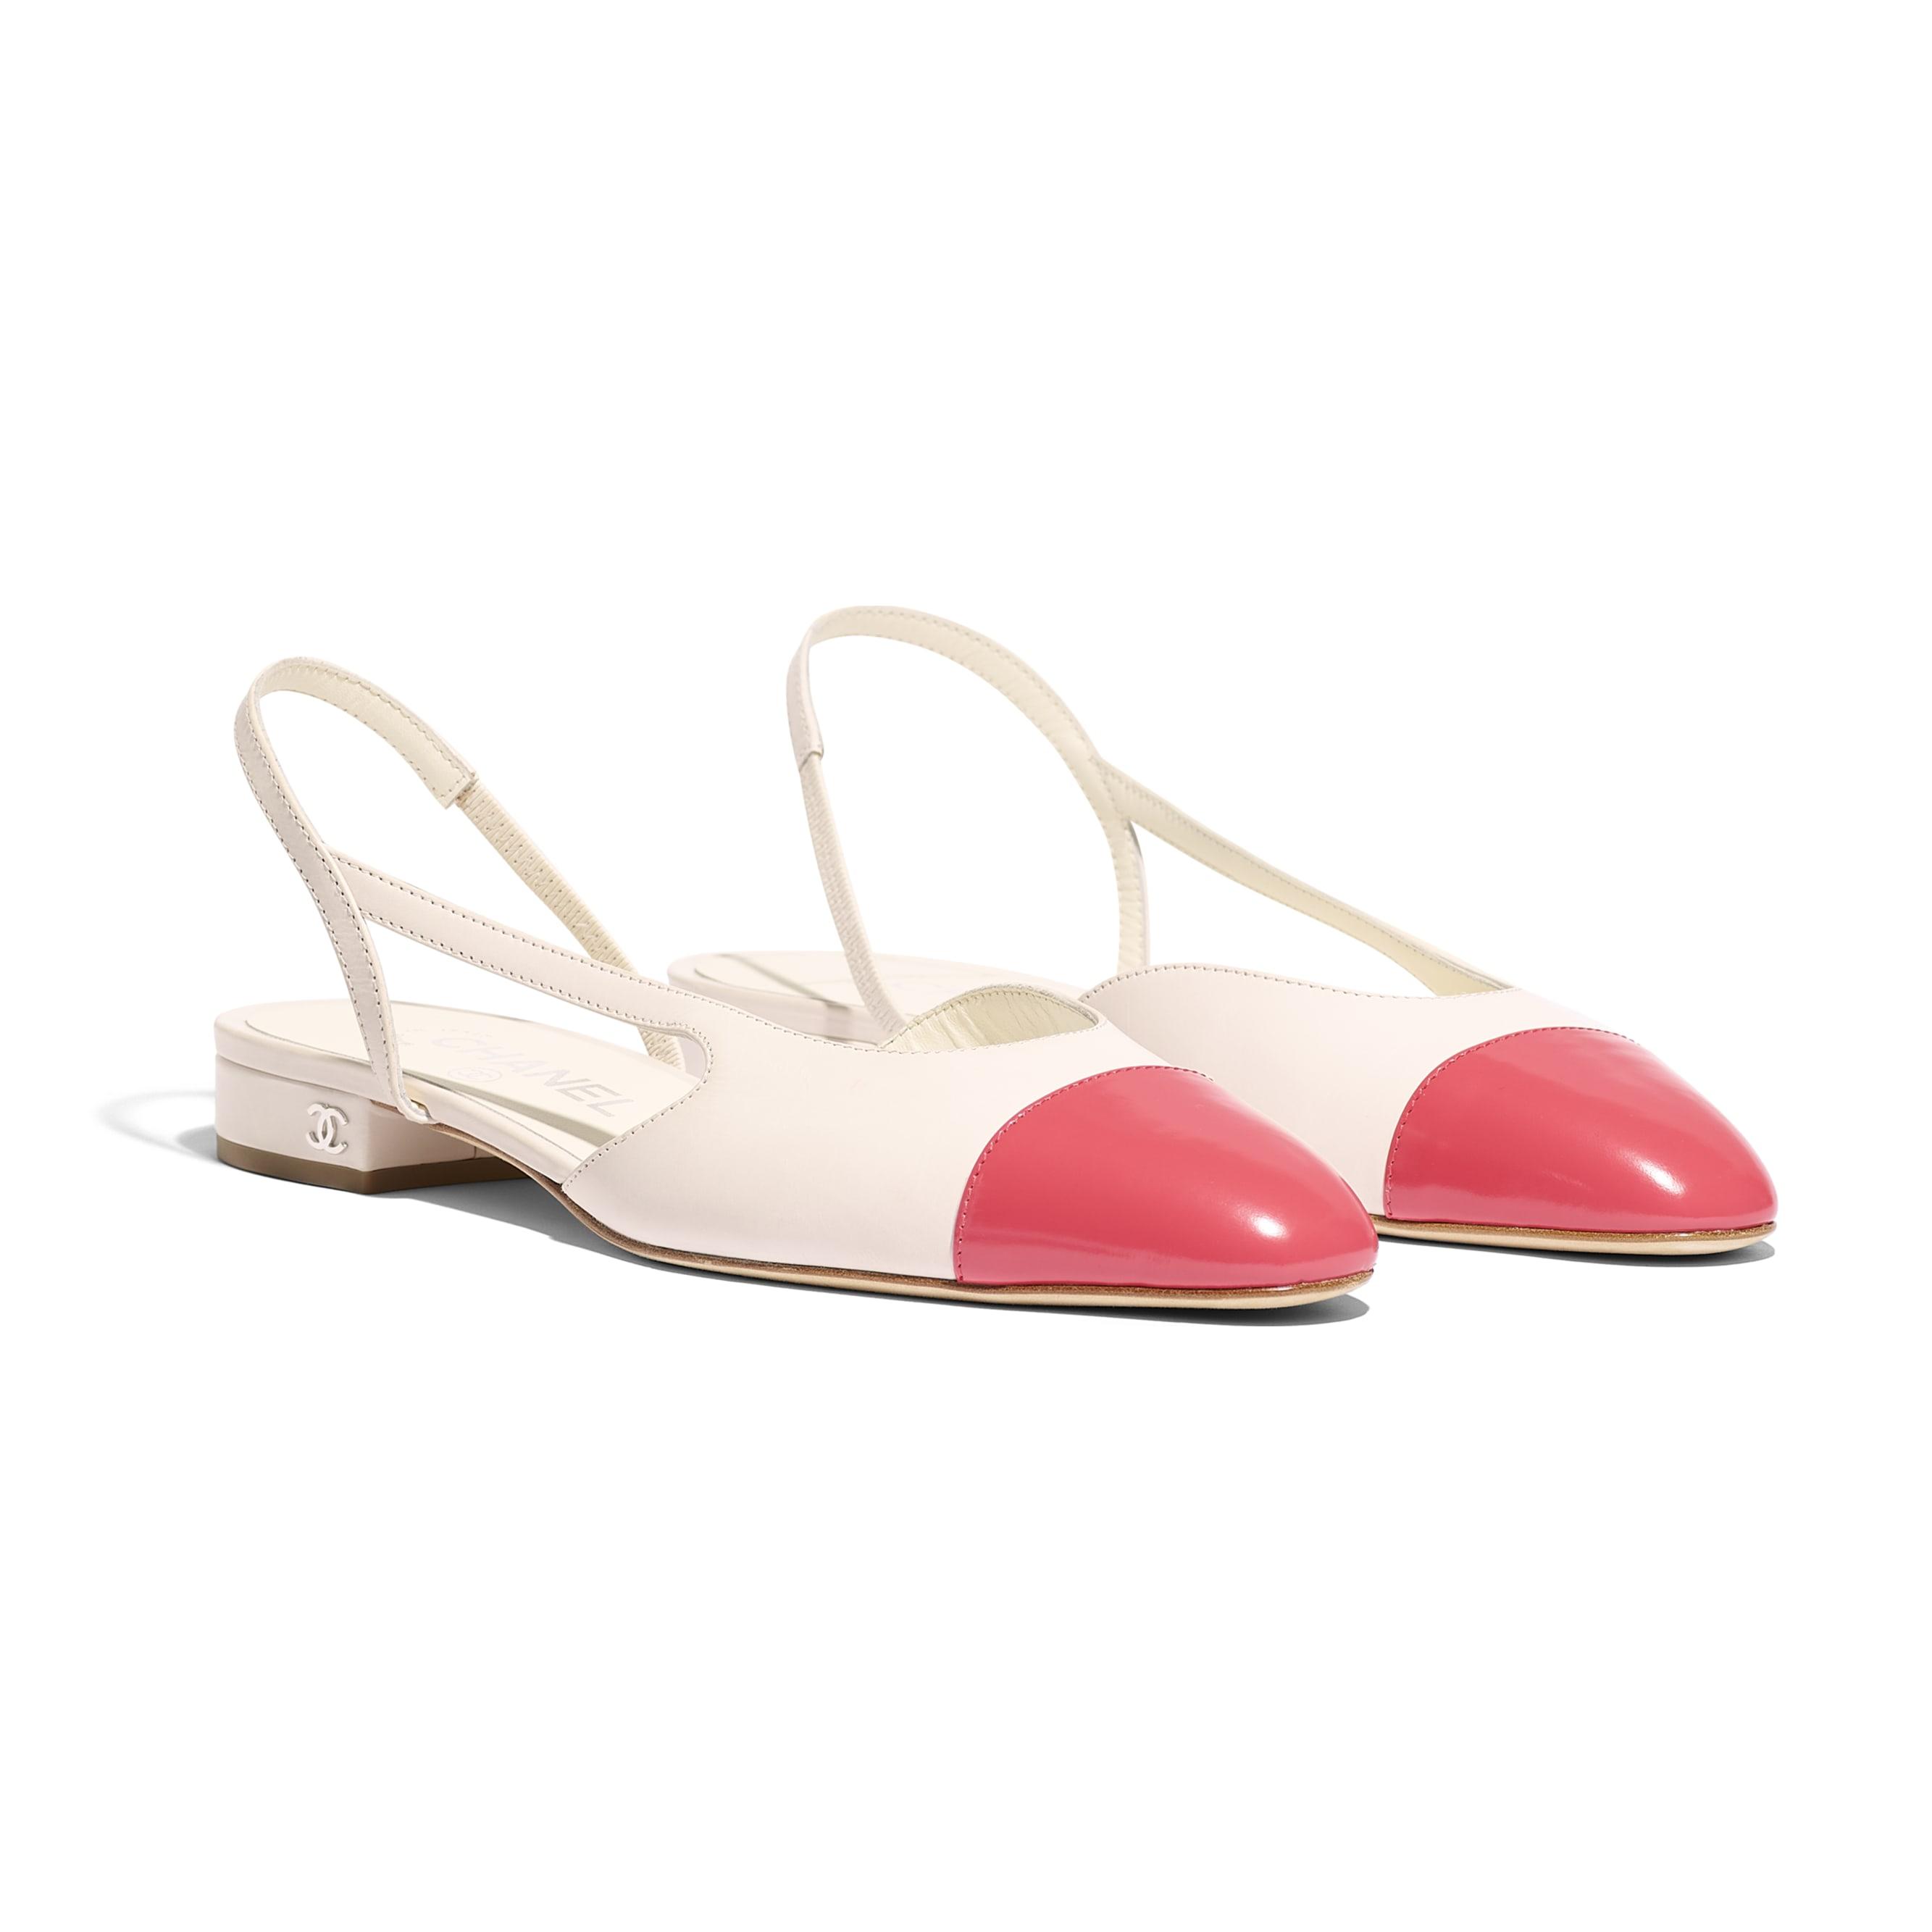 Slingbacks - White & Red - Calfskin & Glazed Calfskin - Alternative view - see standard sized version